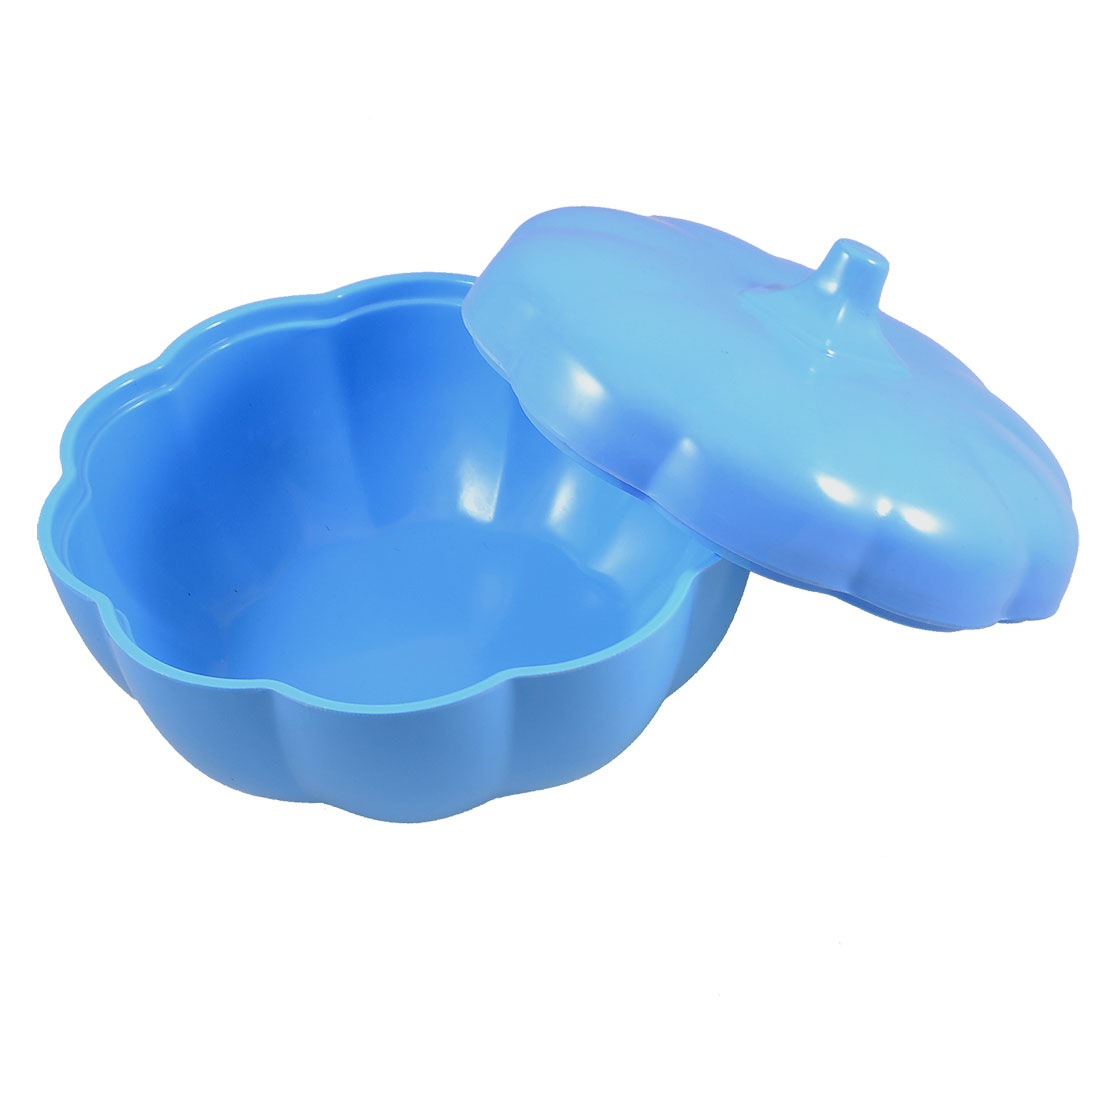 Hard Plastic Blue Pumpkin Shape Covered Candy Dish Holder